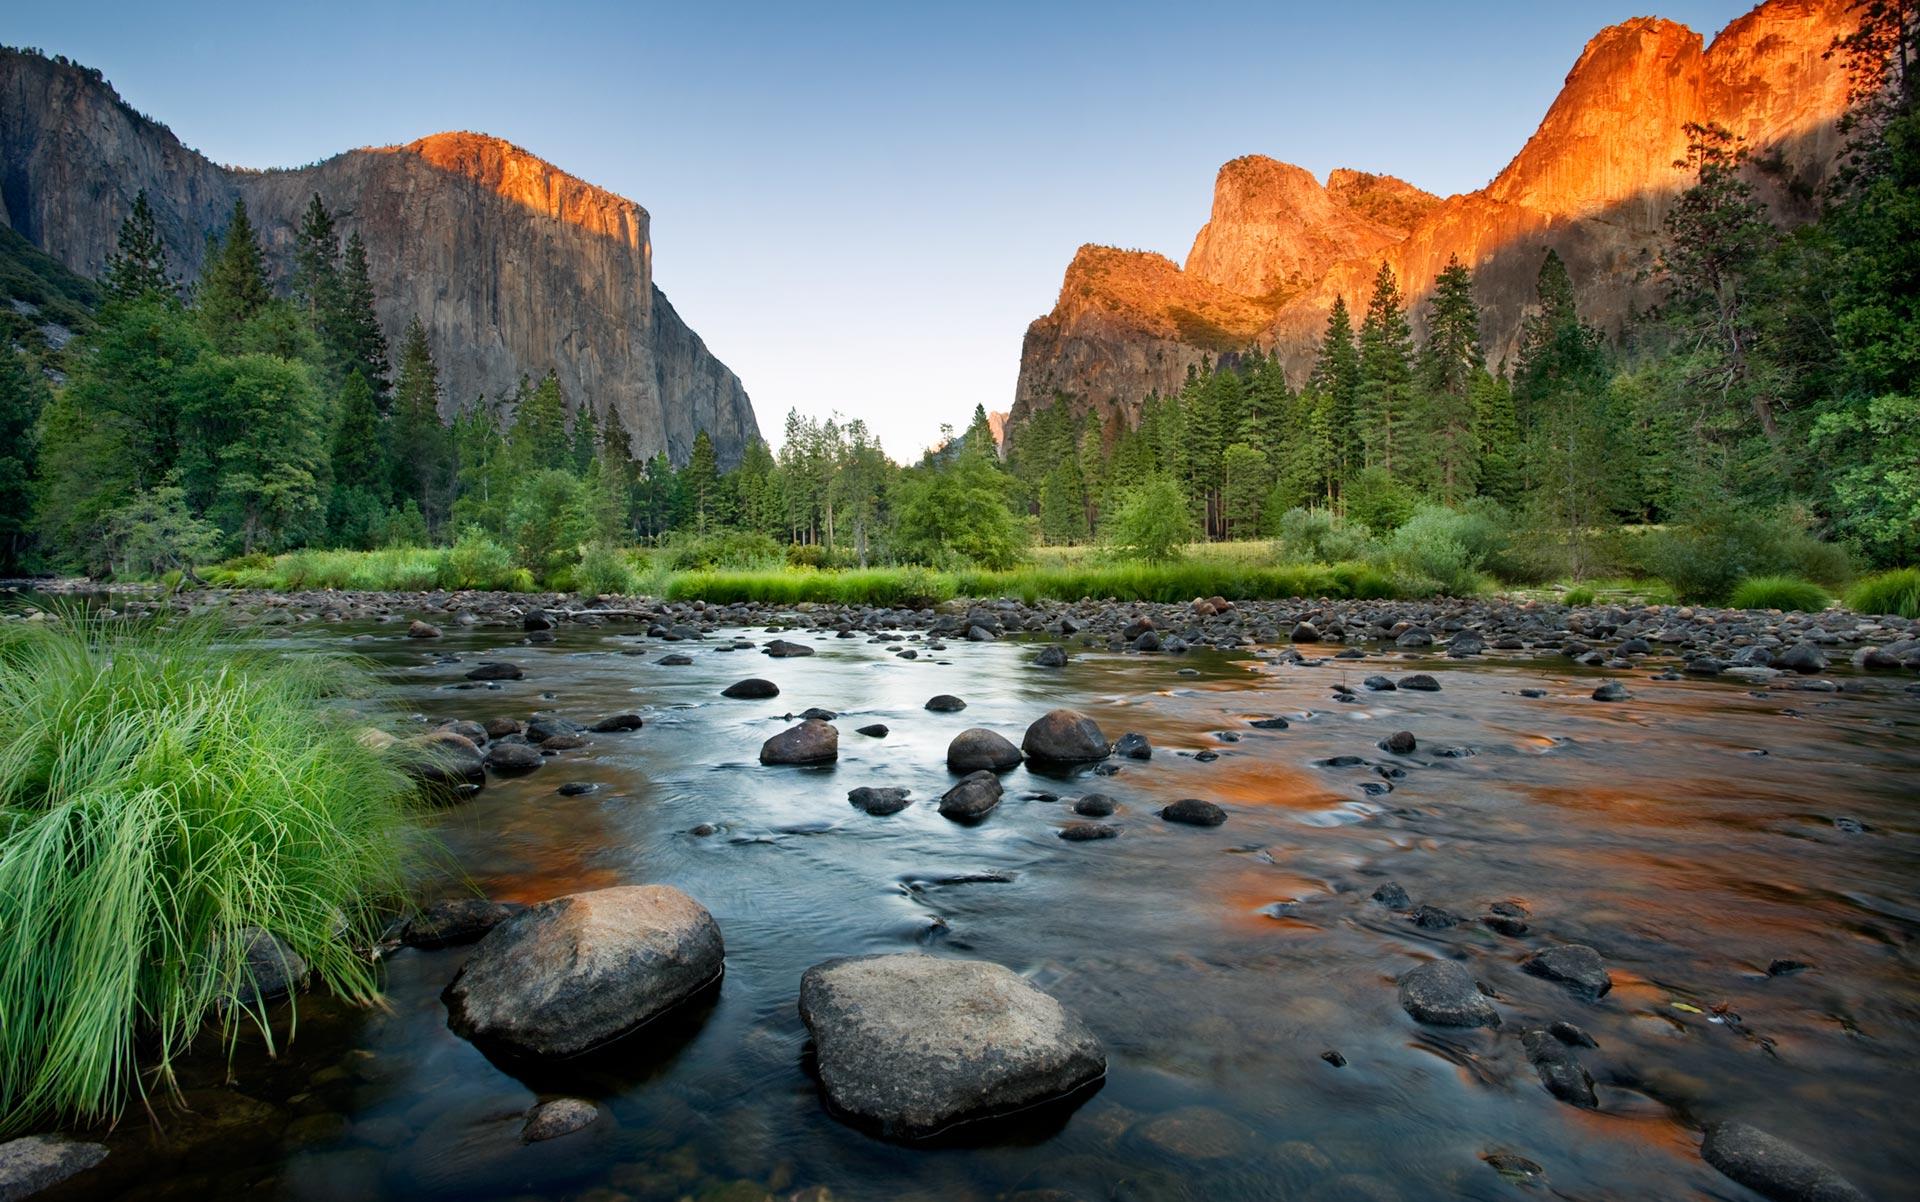 Merced River, California